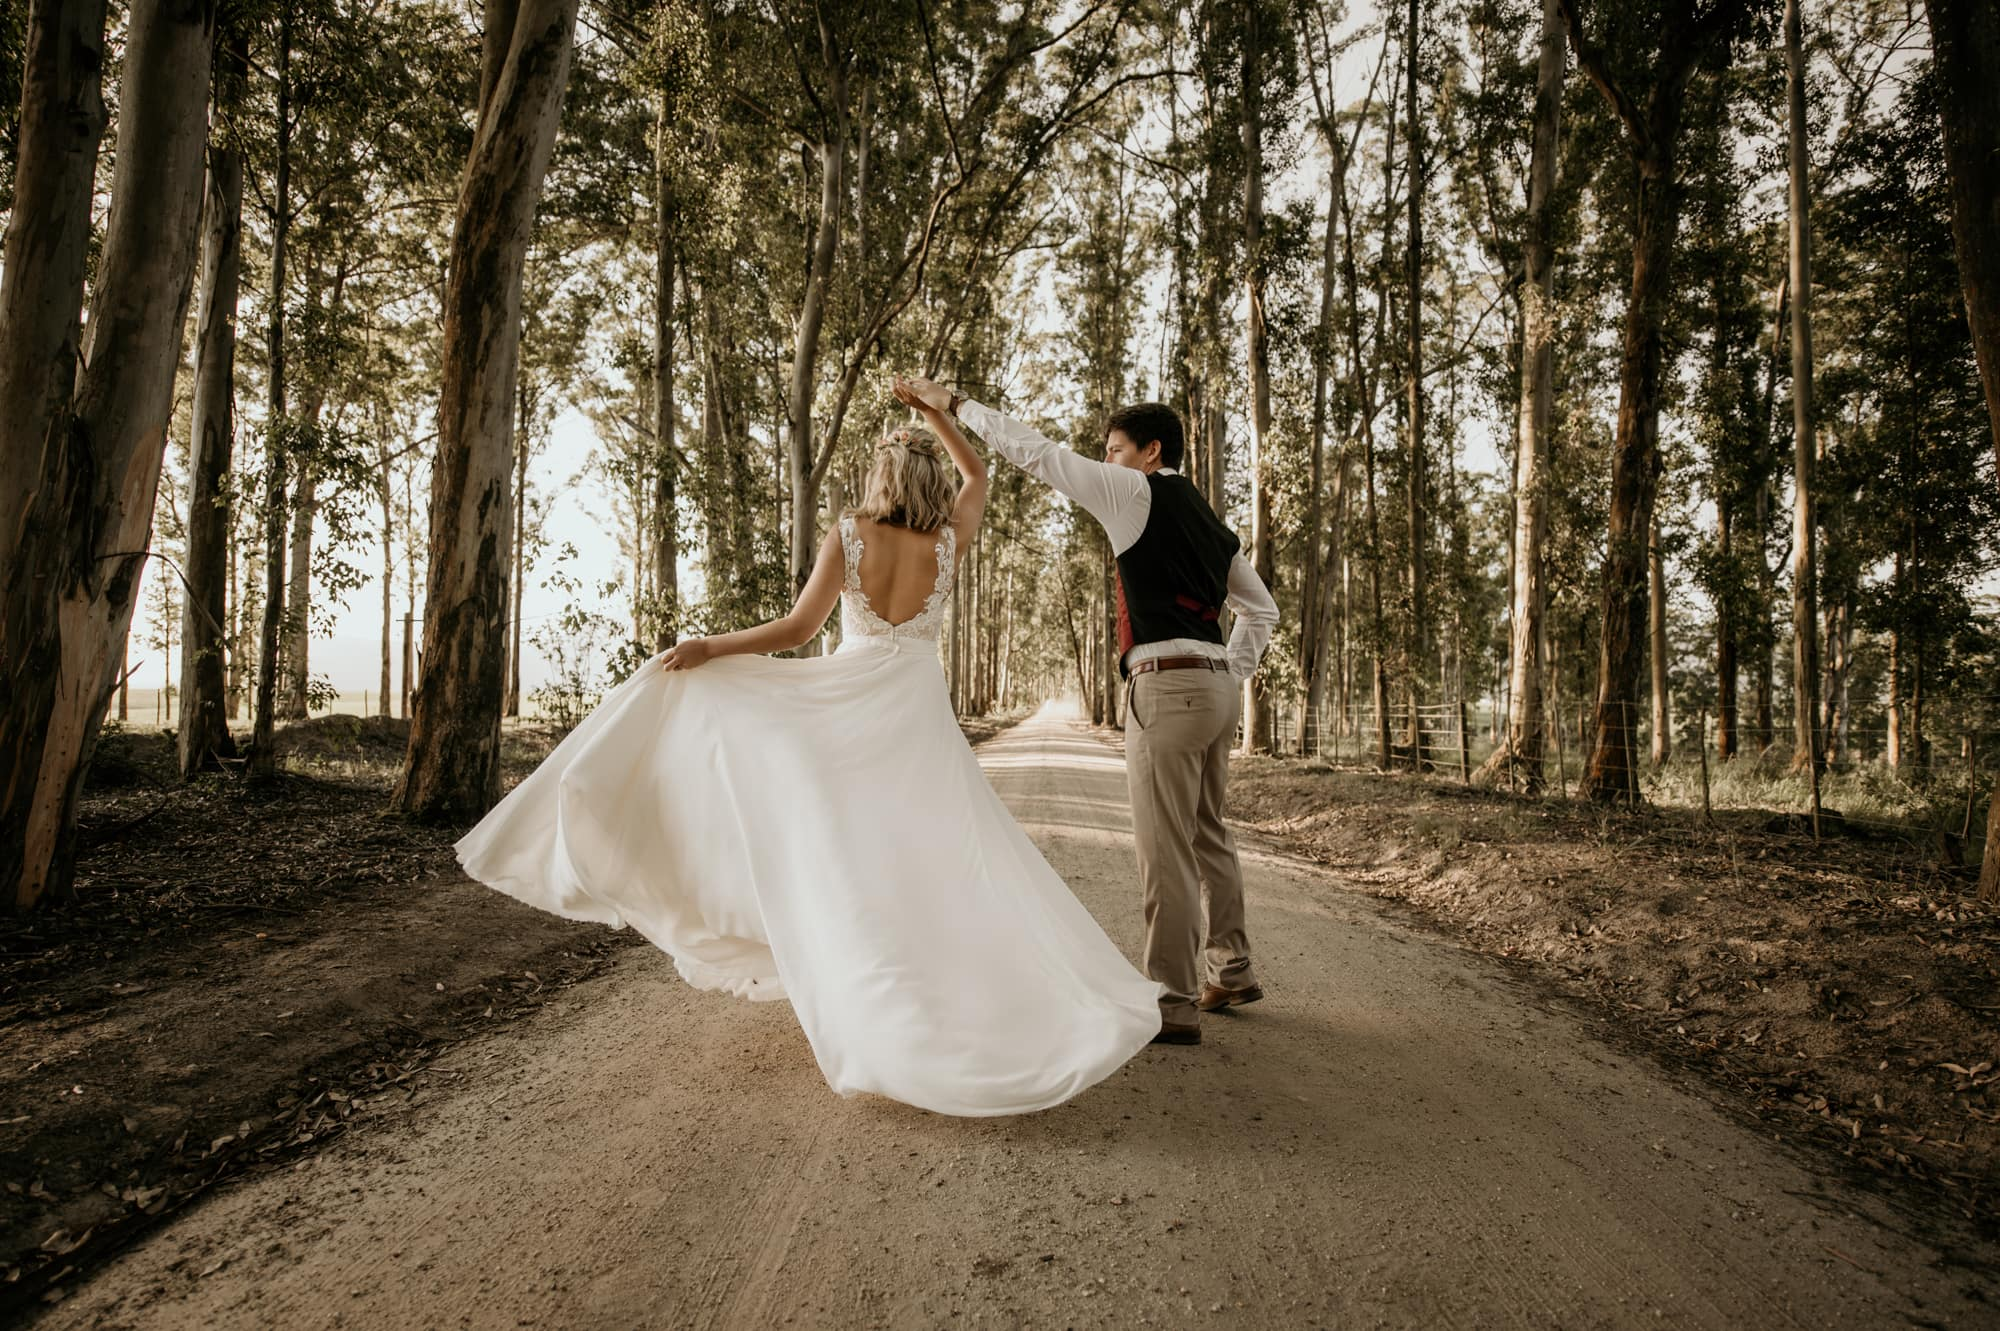 karien-daniel-oakhurst-wedding-June-Richards-Photography-Destination-Weddings-Elopements-Garden-Route-19_1